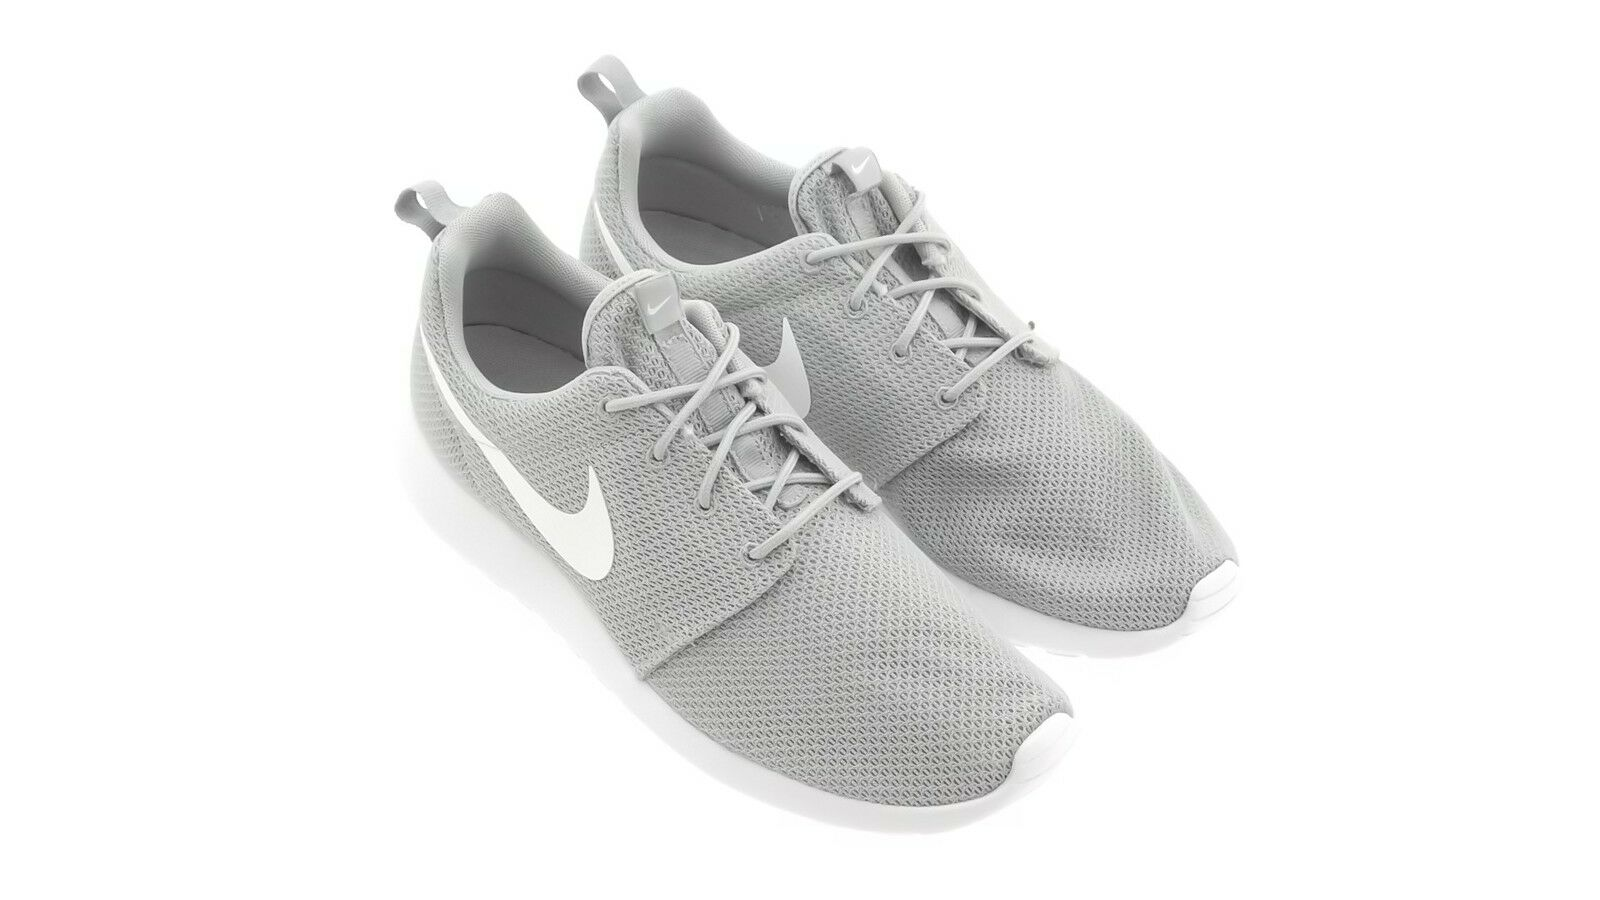 511881-023 Nike Men Rosherun gray white